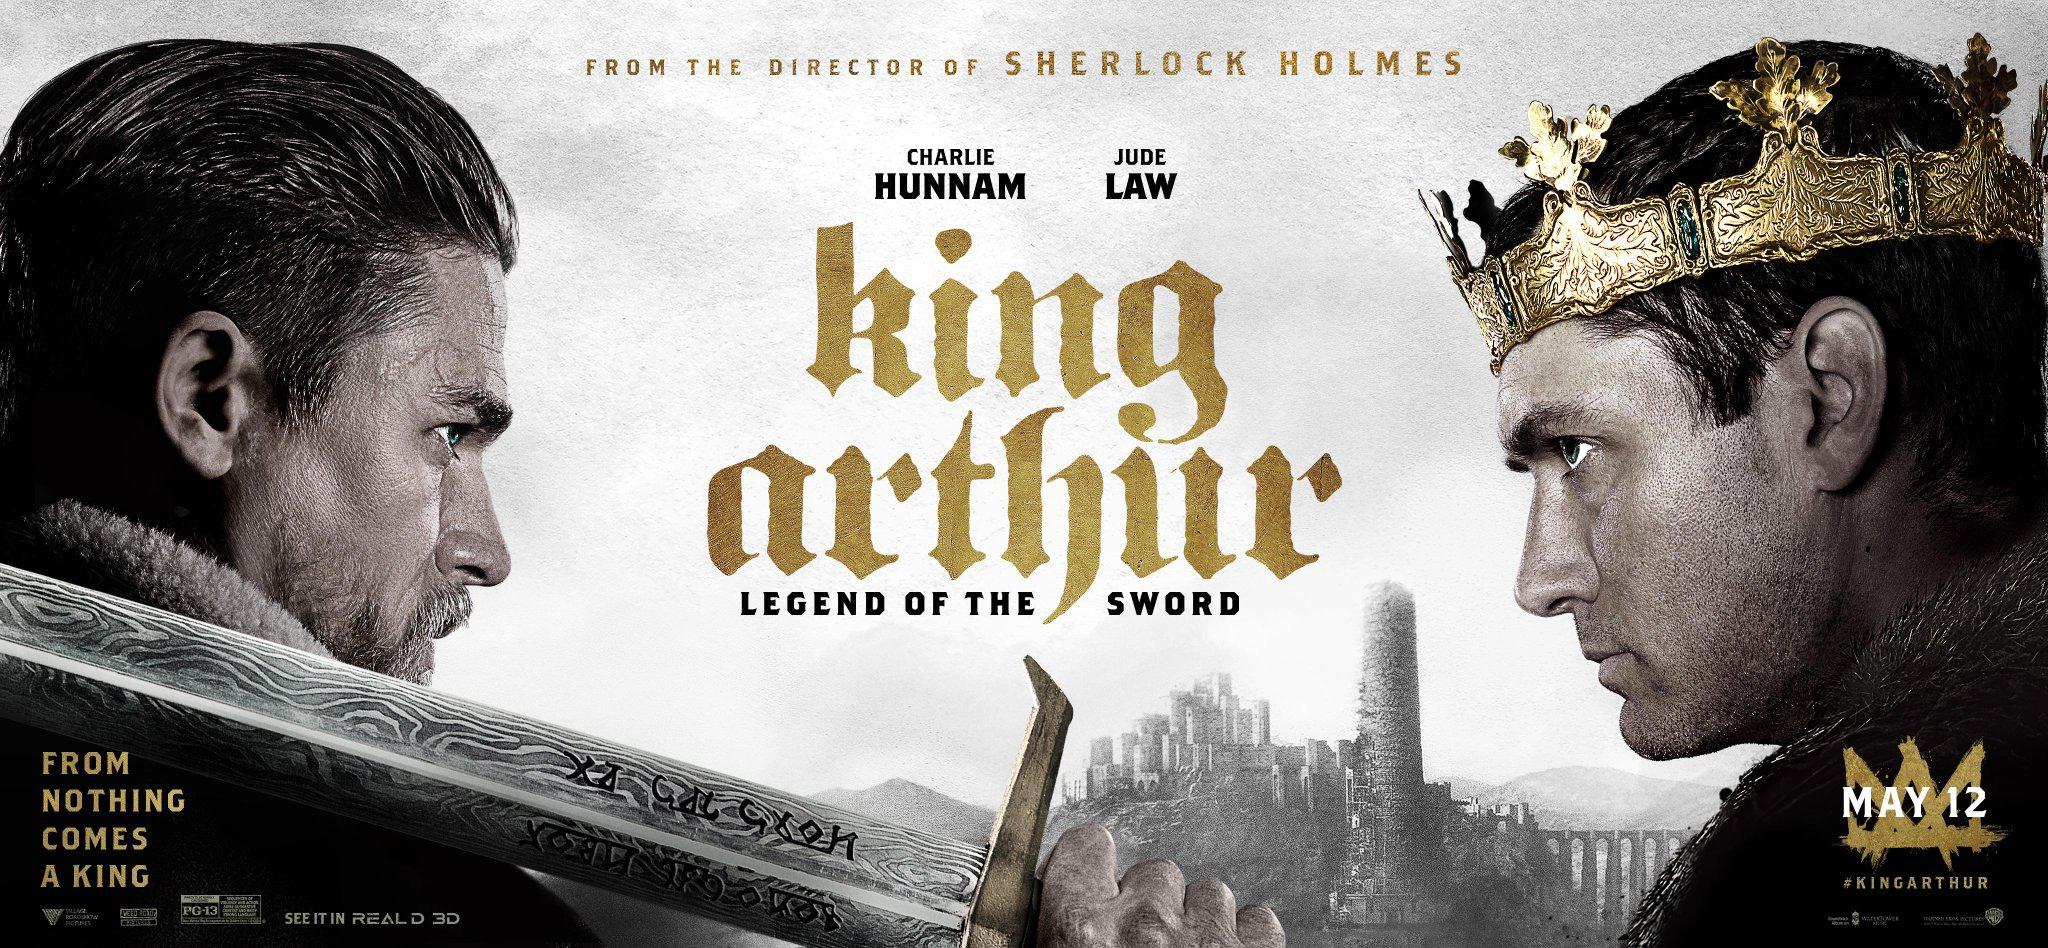 King Arthur: Legend of the Sword Offiical Poster